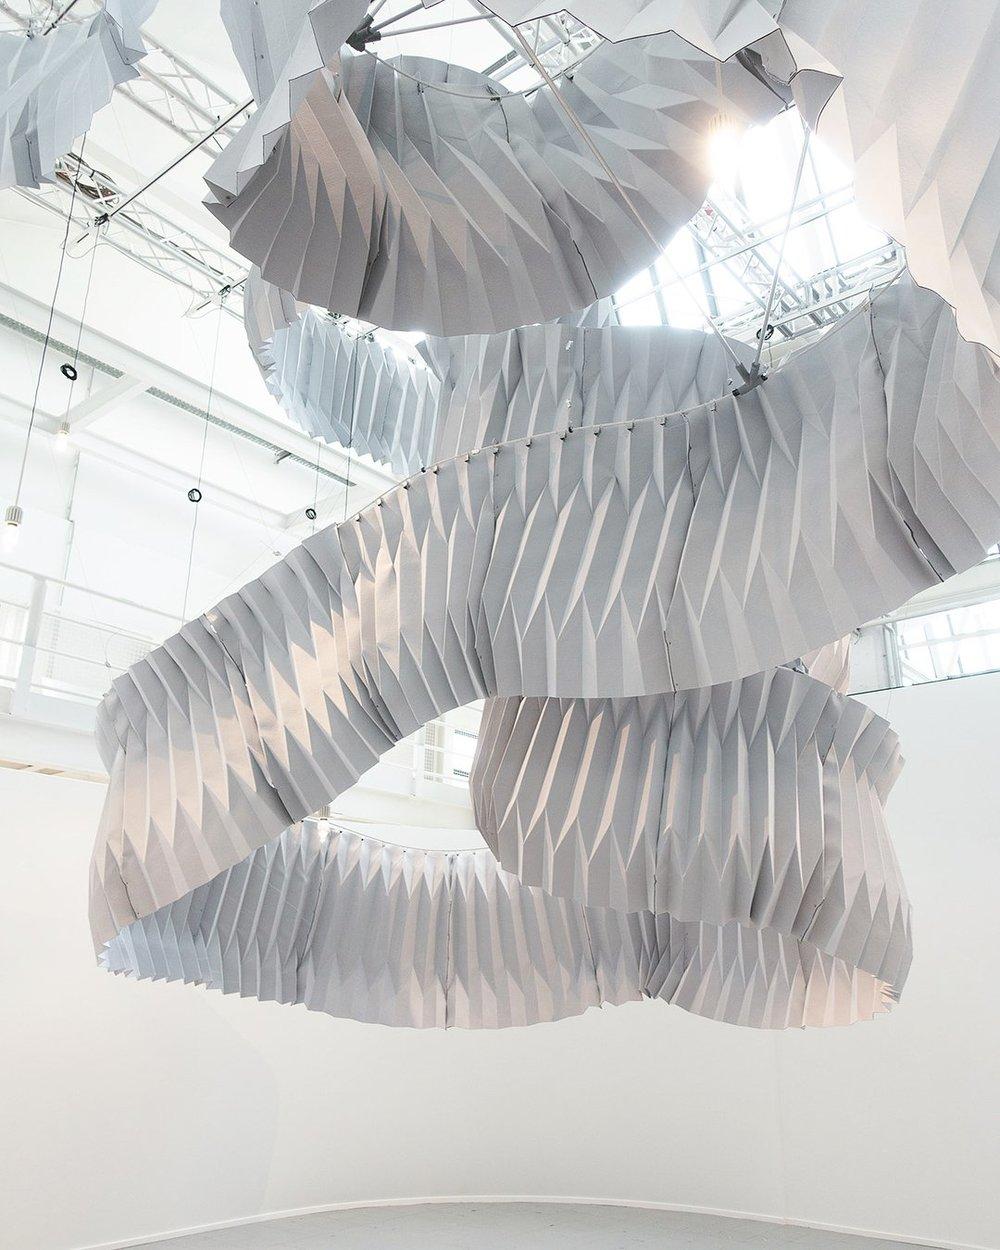 Installation at Milan Design Week 2018. (Courtesy of Kengo Kuma and Associates)